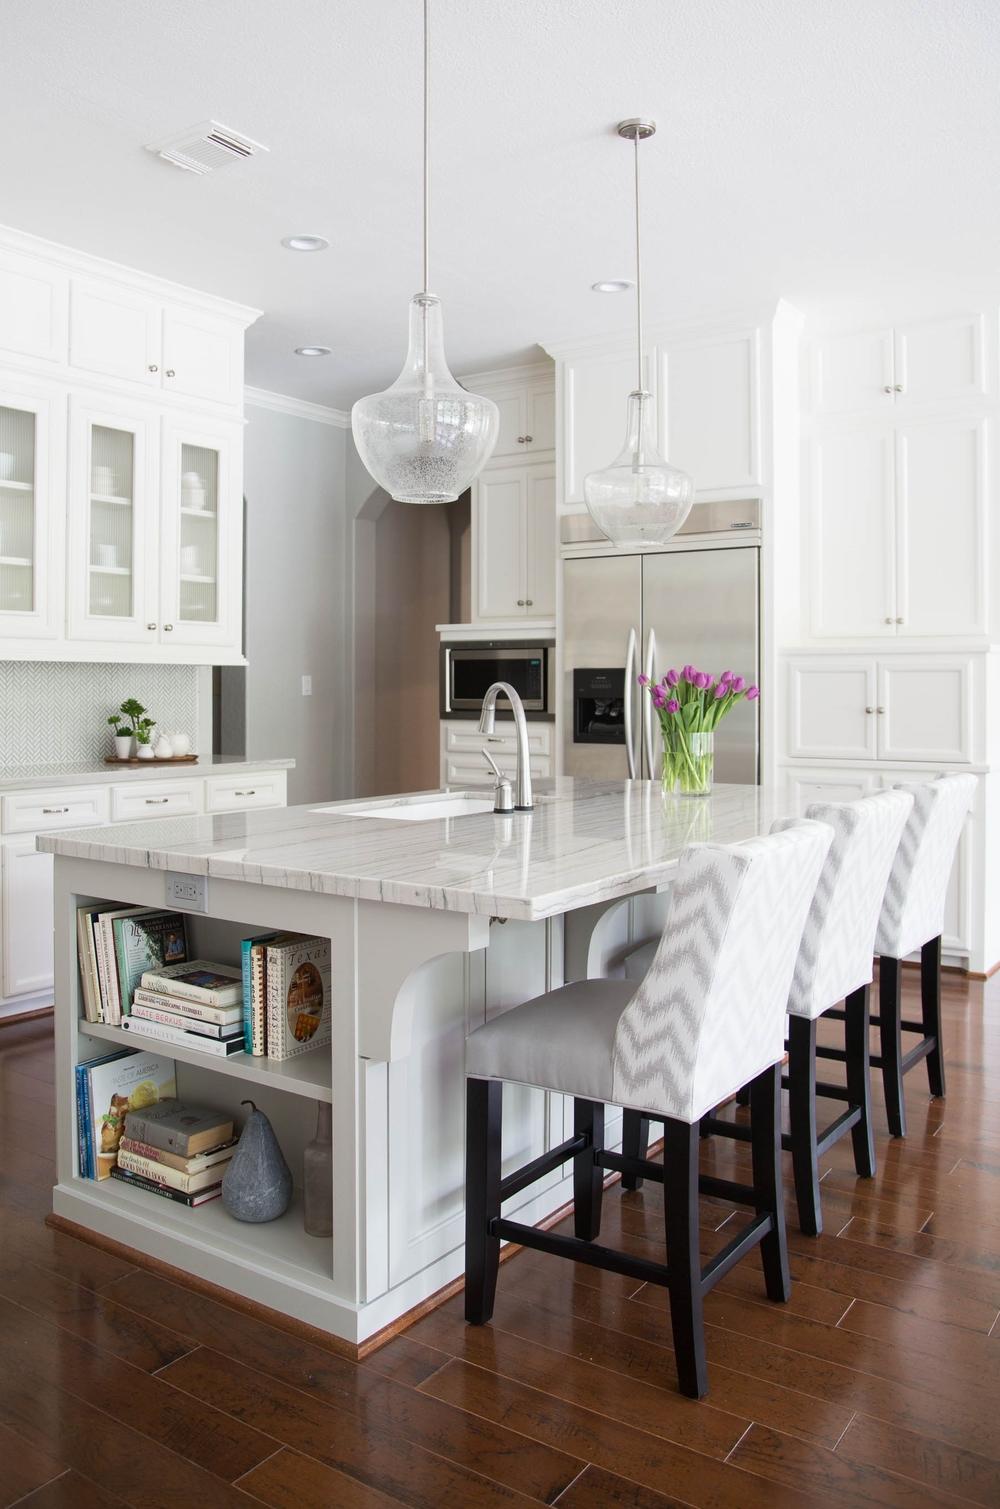 Overall 2 - Kitchen Remodel - Carla Aston, Designer - Tori Aston, Photographer